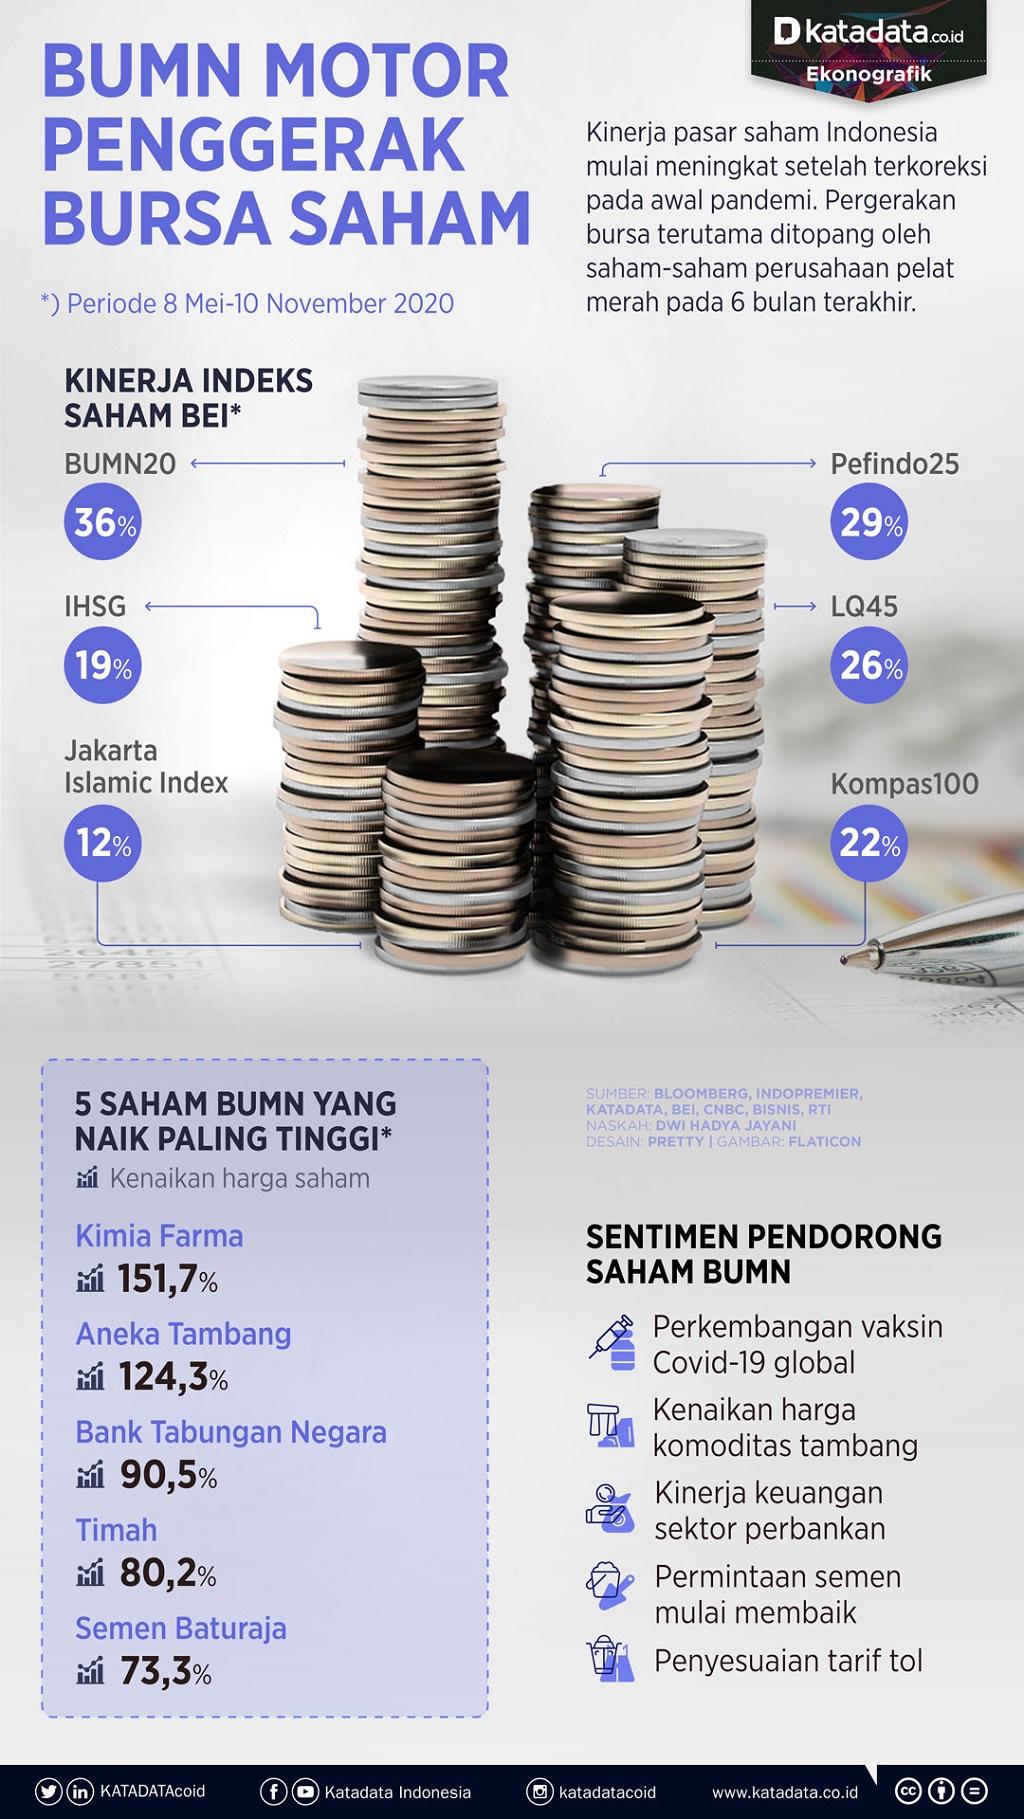 Infografik_BUMN motor penggerak bursa saham_rev